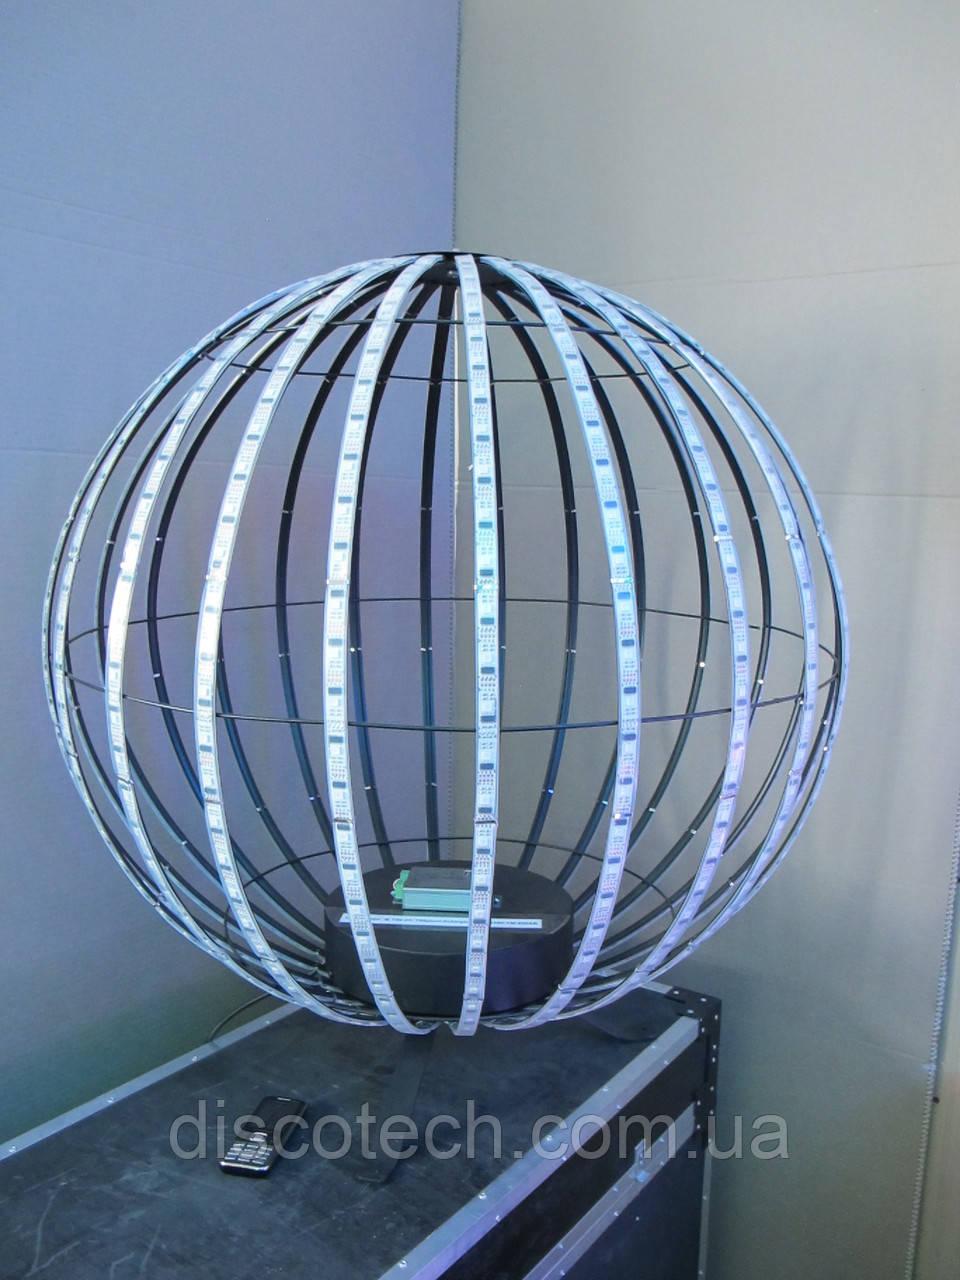 Сфера диаметр- 720мм, 24луча, 32пикс/луч, шаг-32мм (768пикс, 192W, БП-300W/5V-1шт)